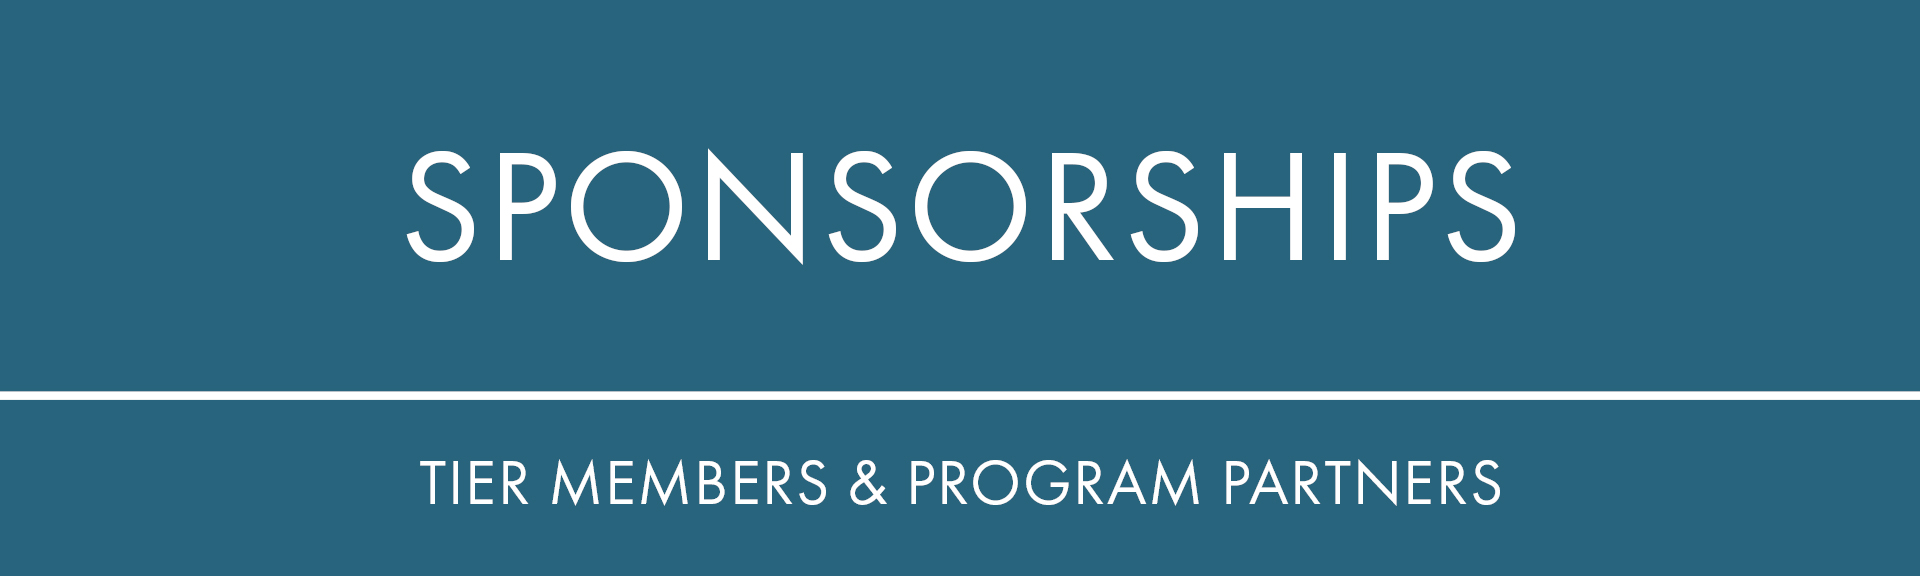 sponsor sponsorship tier members program partners platform showcase branding company industry leader business community GVCC Greater Vancouver Chamber of Commerce